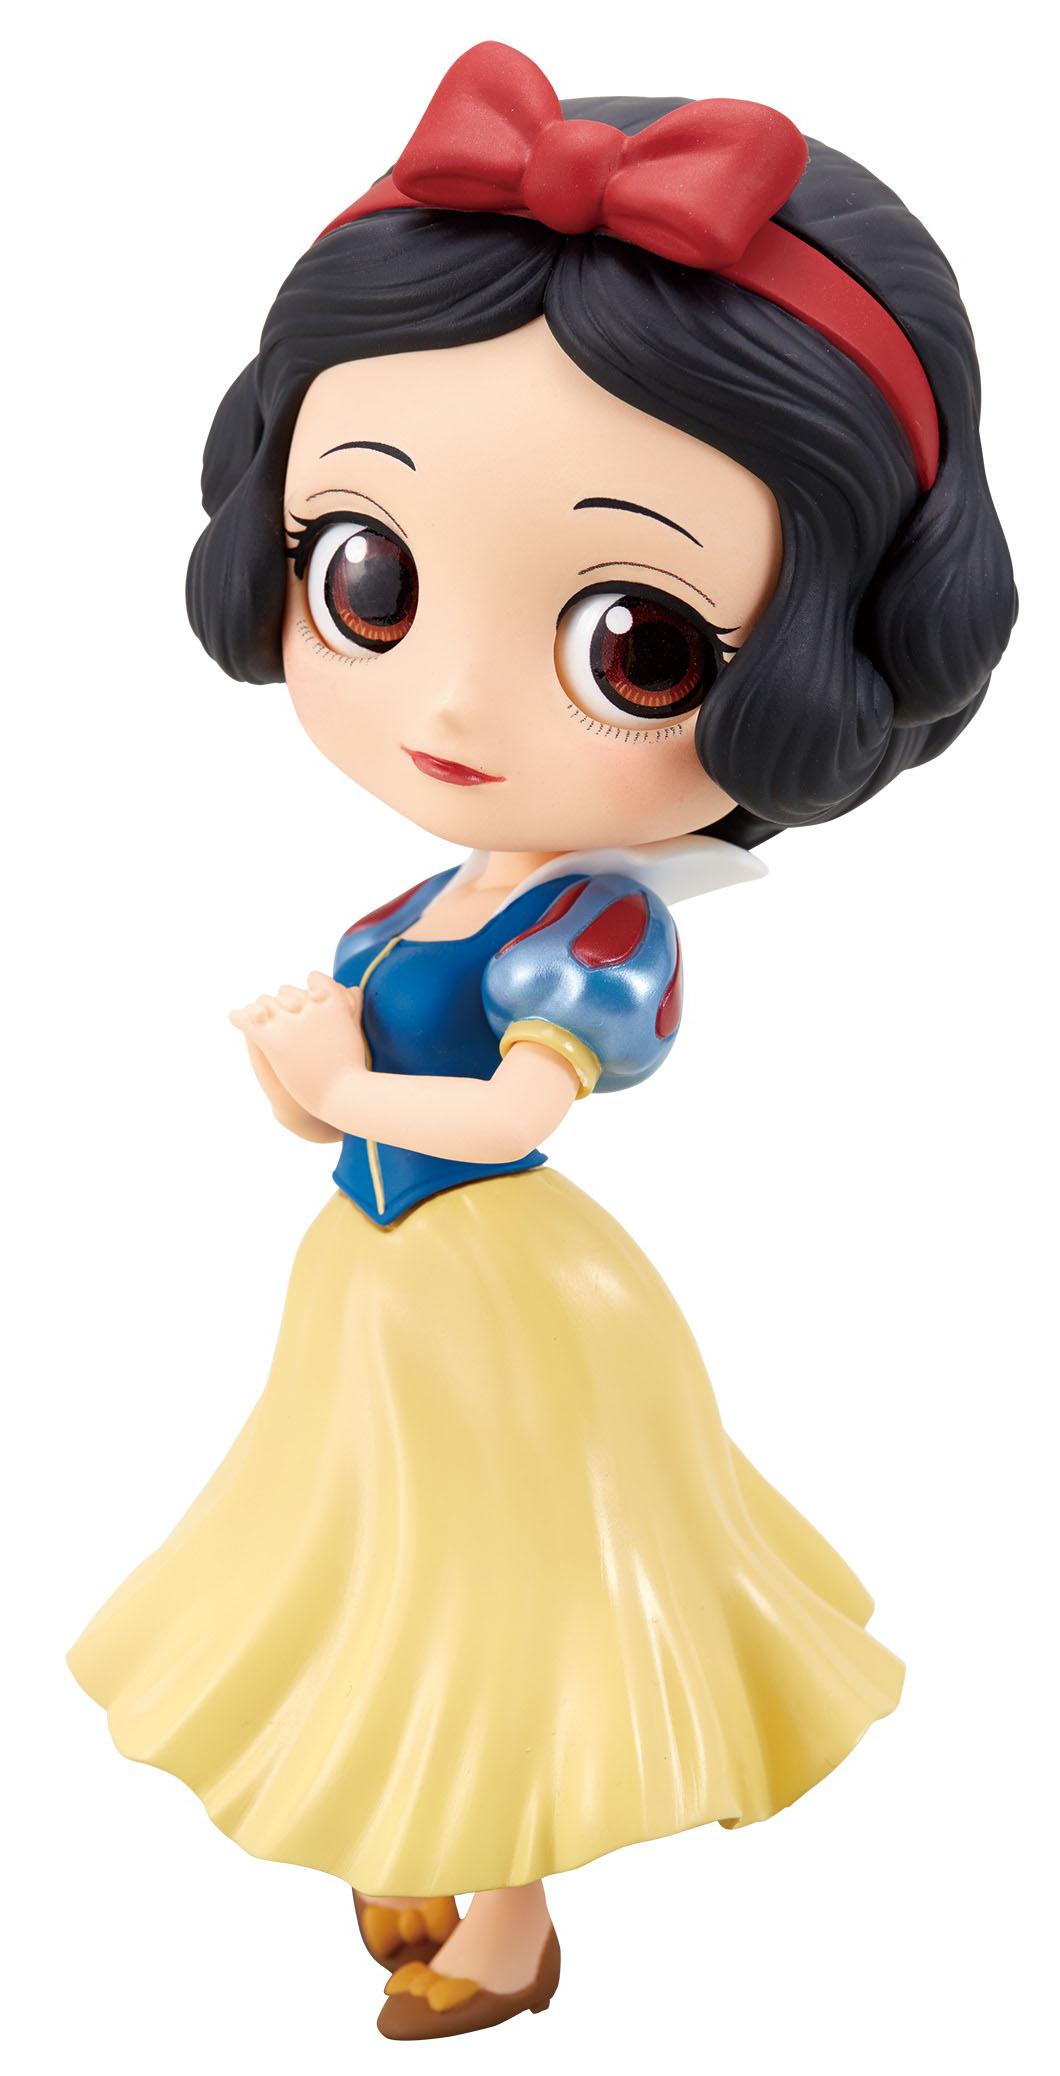 Фигурка Q Posket Disney Characters: Snow White And The Seven Dwarfs – (14 см)